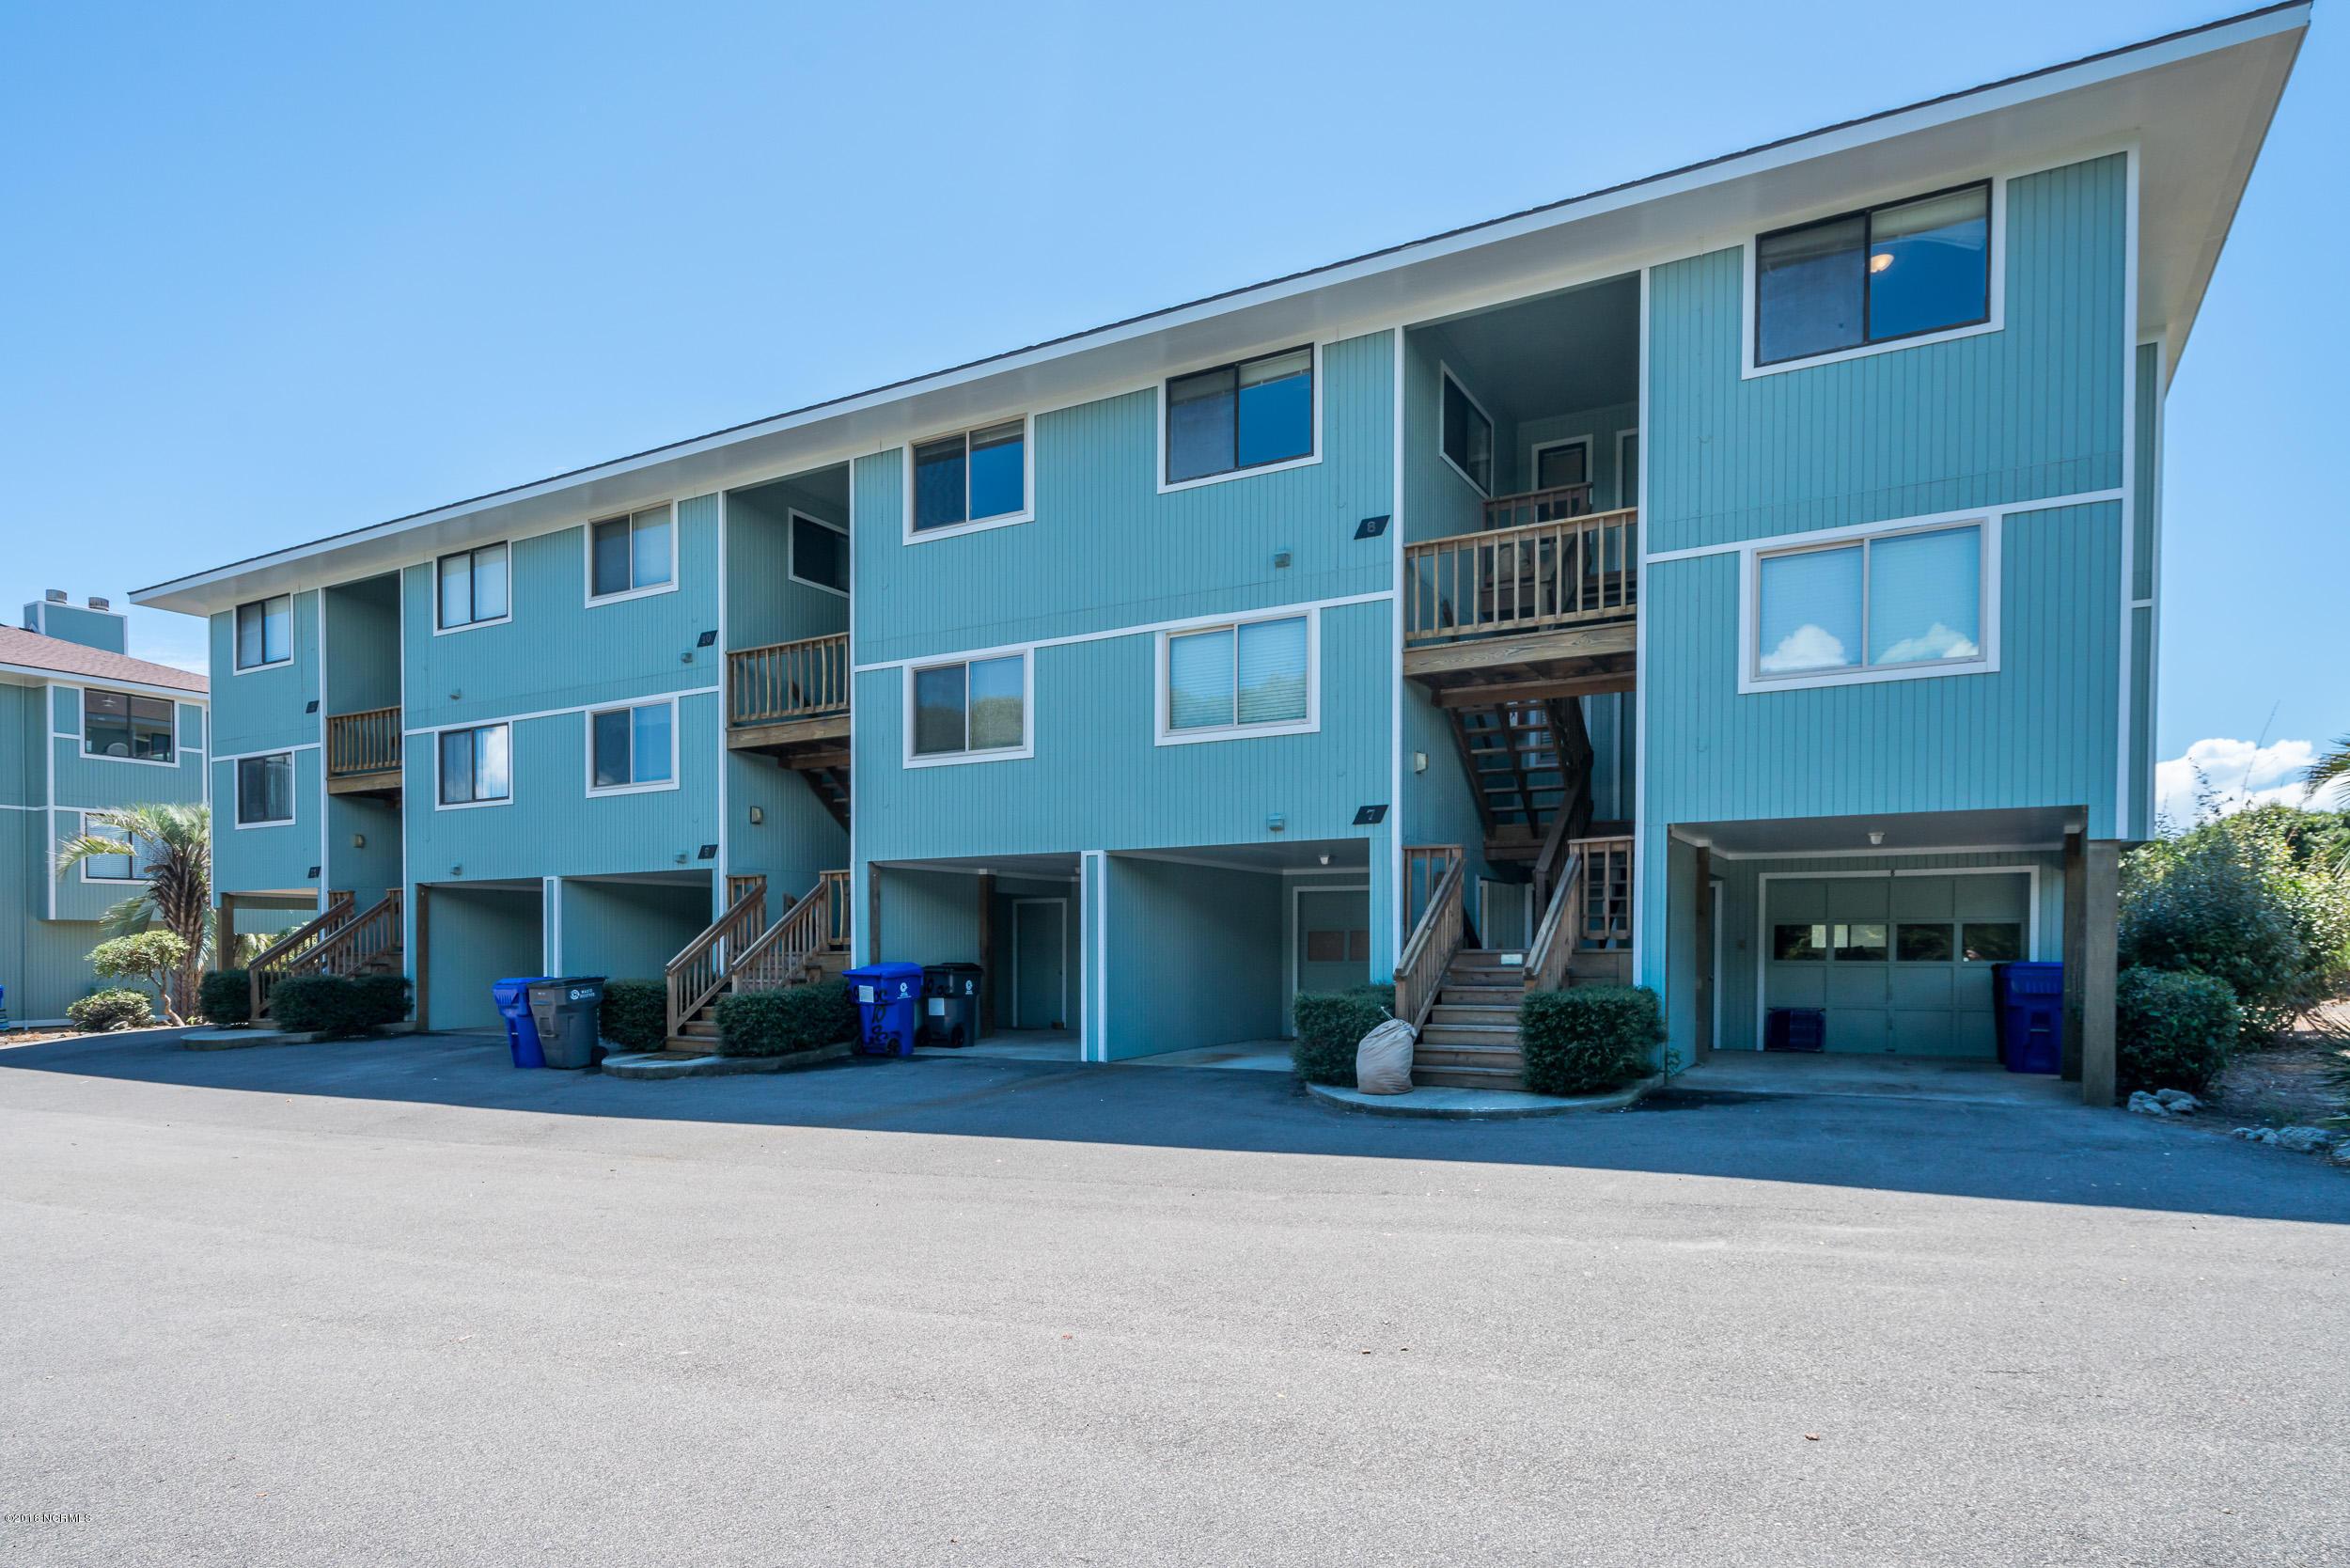 11 Ocean Court Caswell Beach, NC 28465